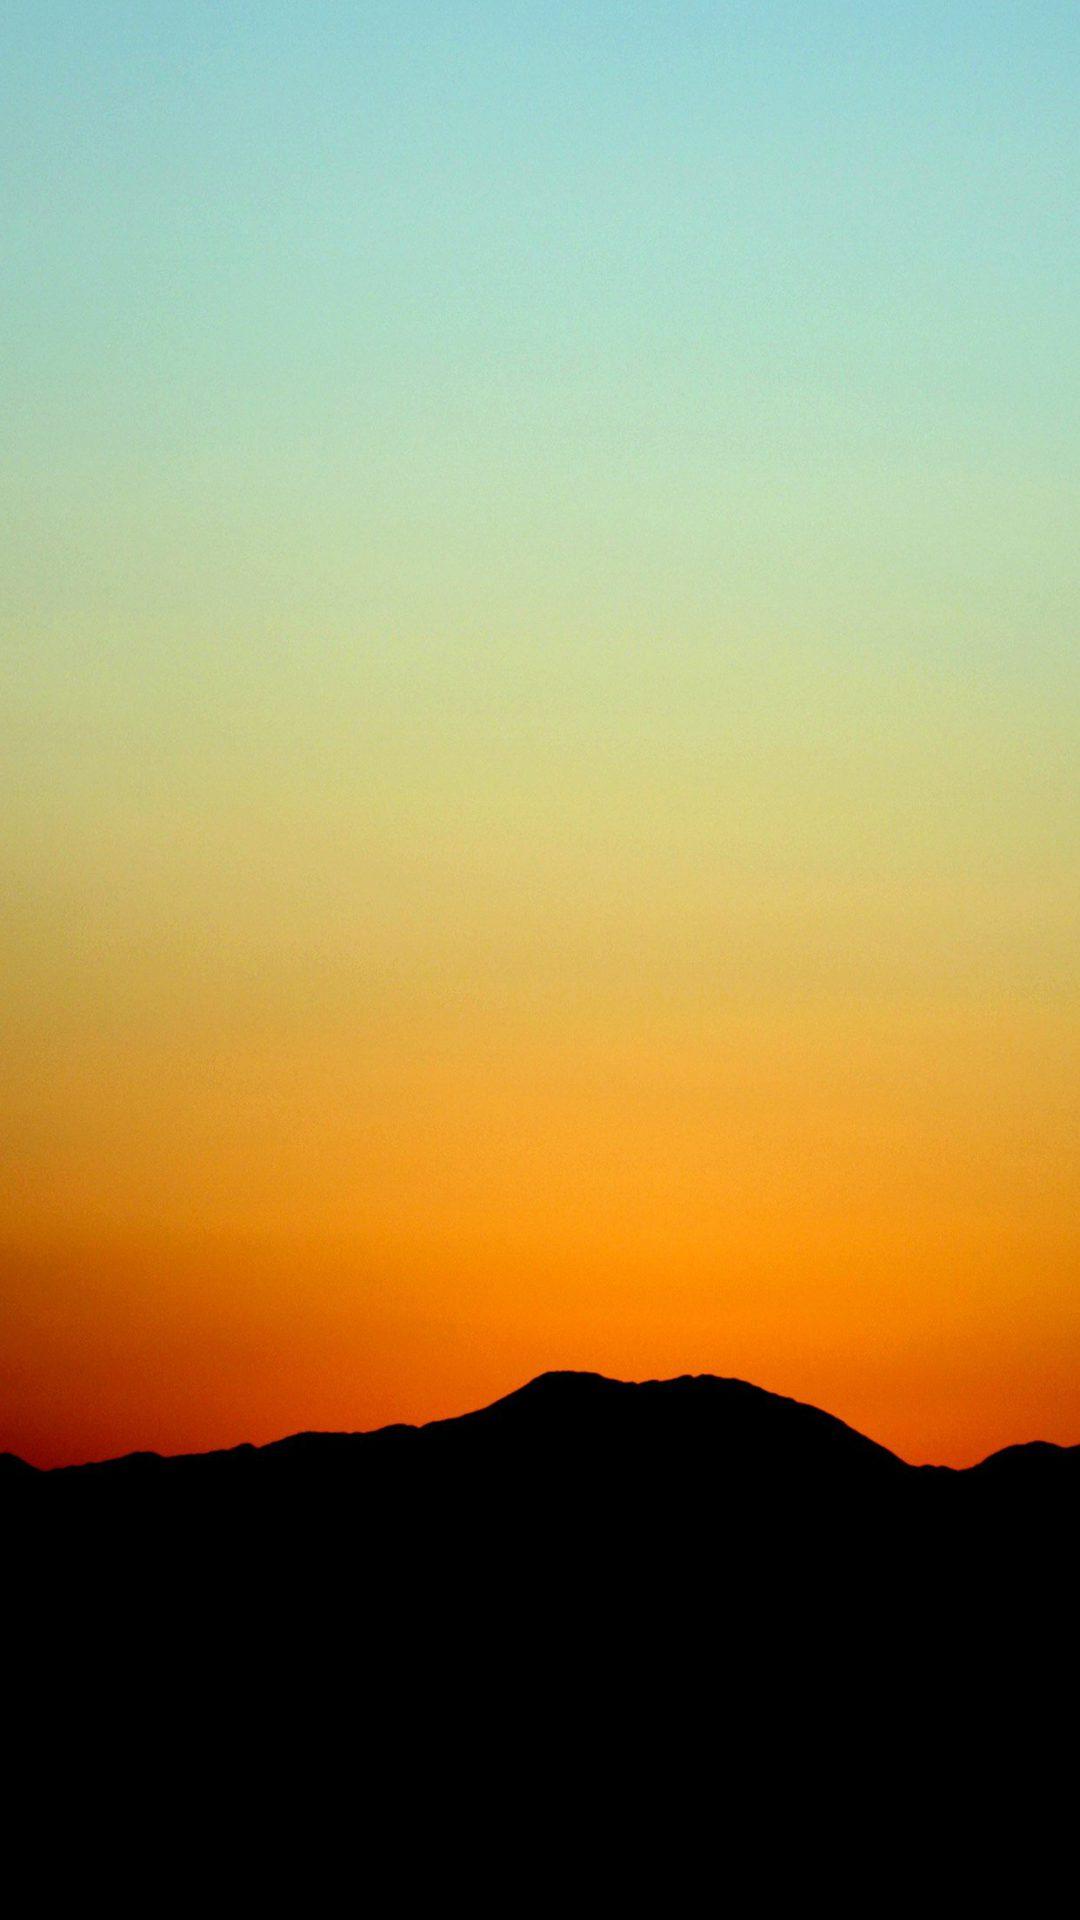 Sunset Sky Minimal Nature Red